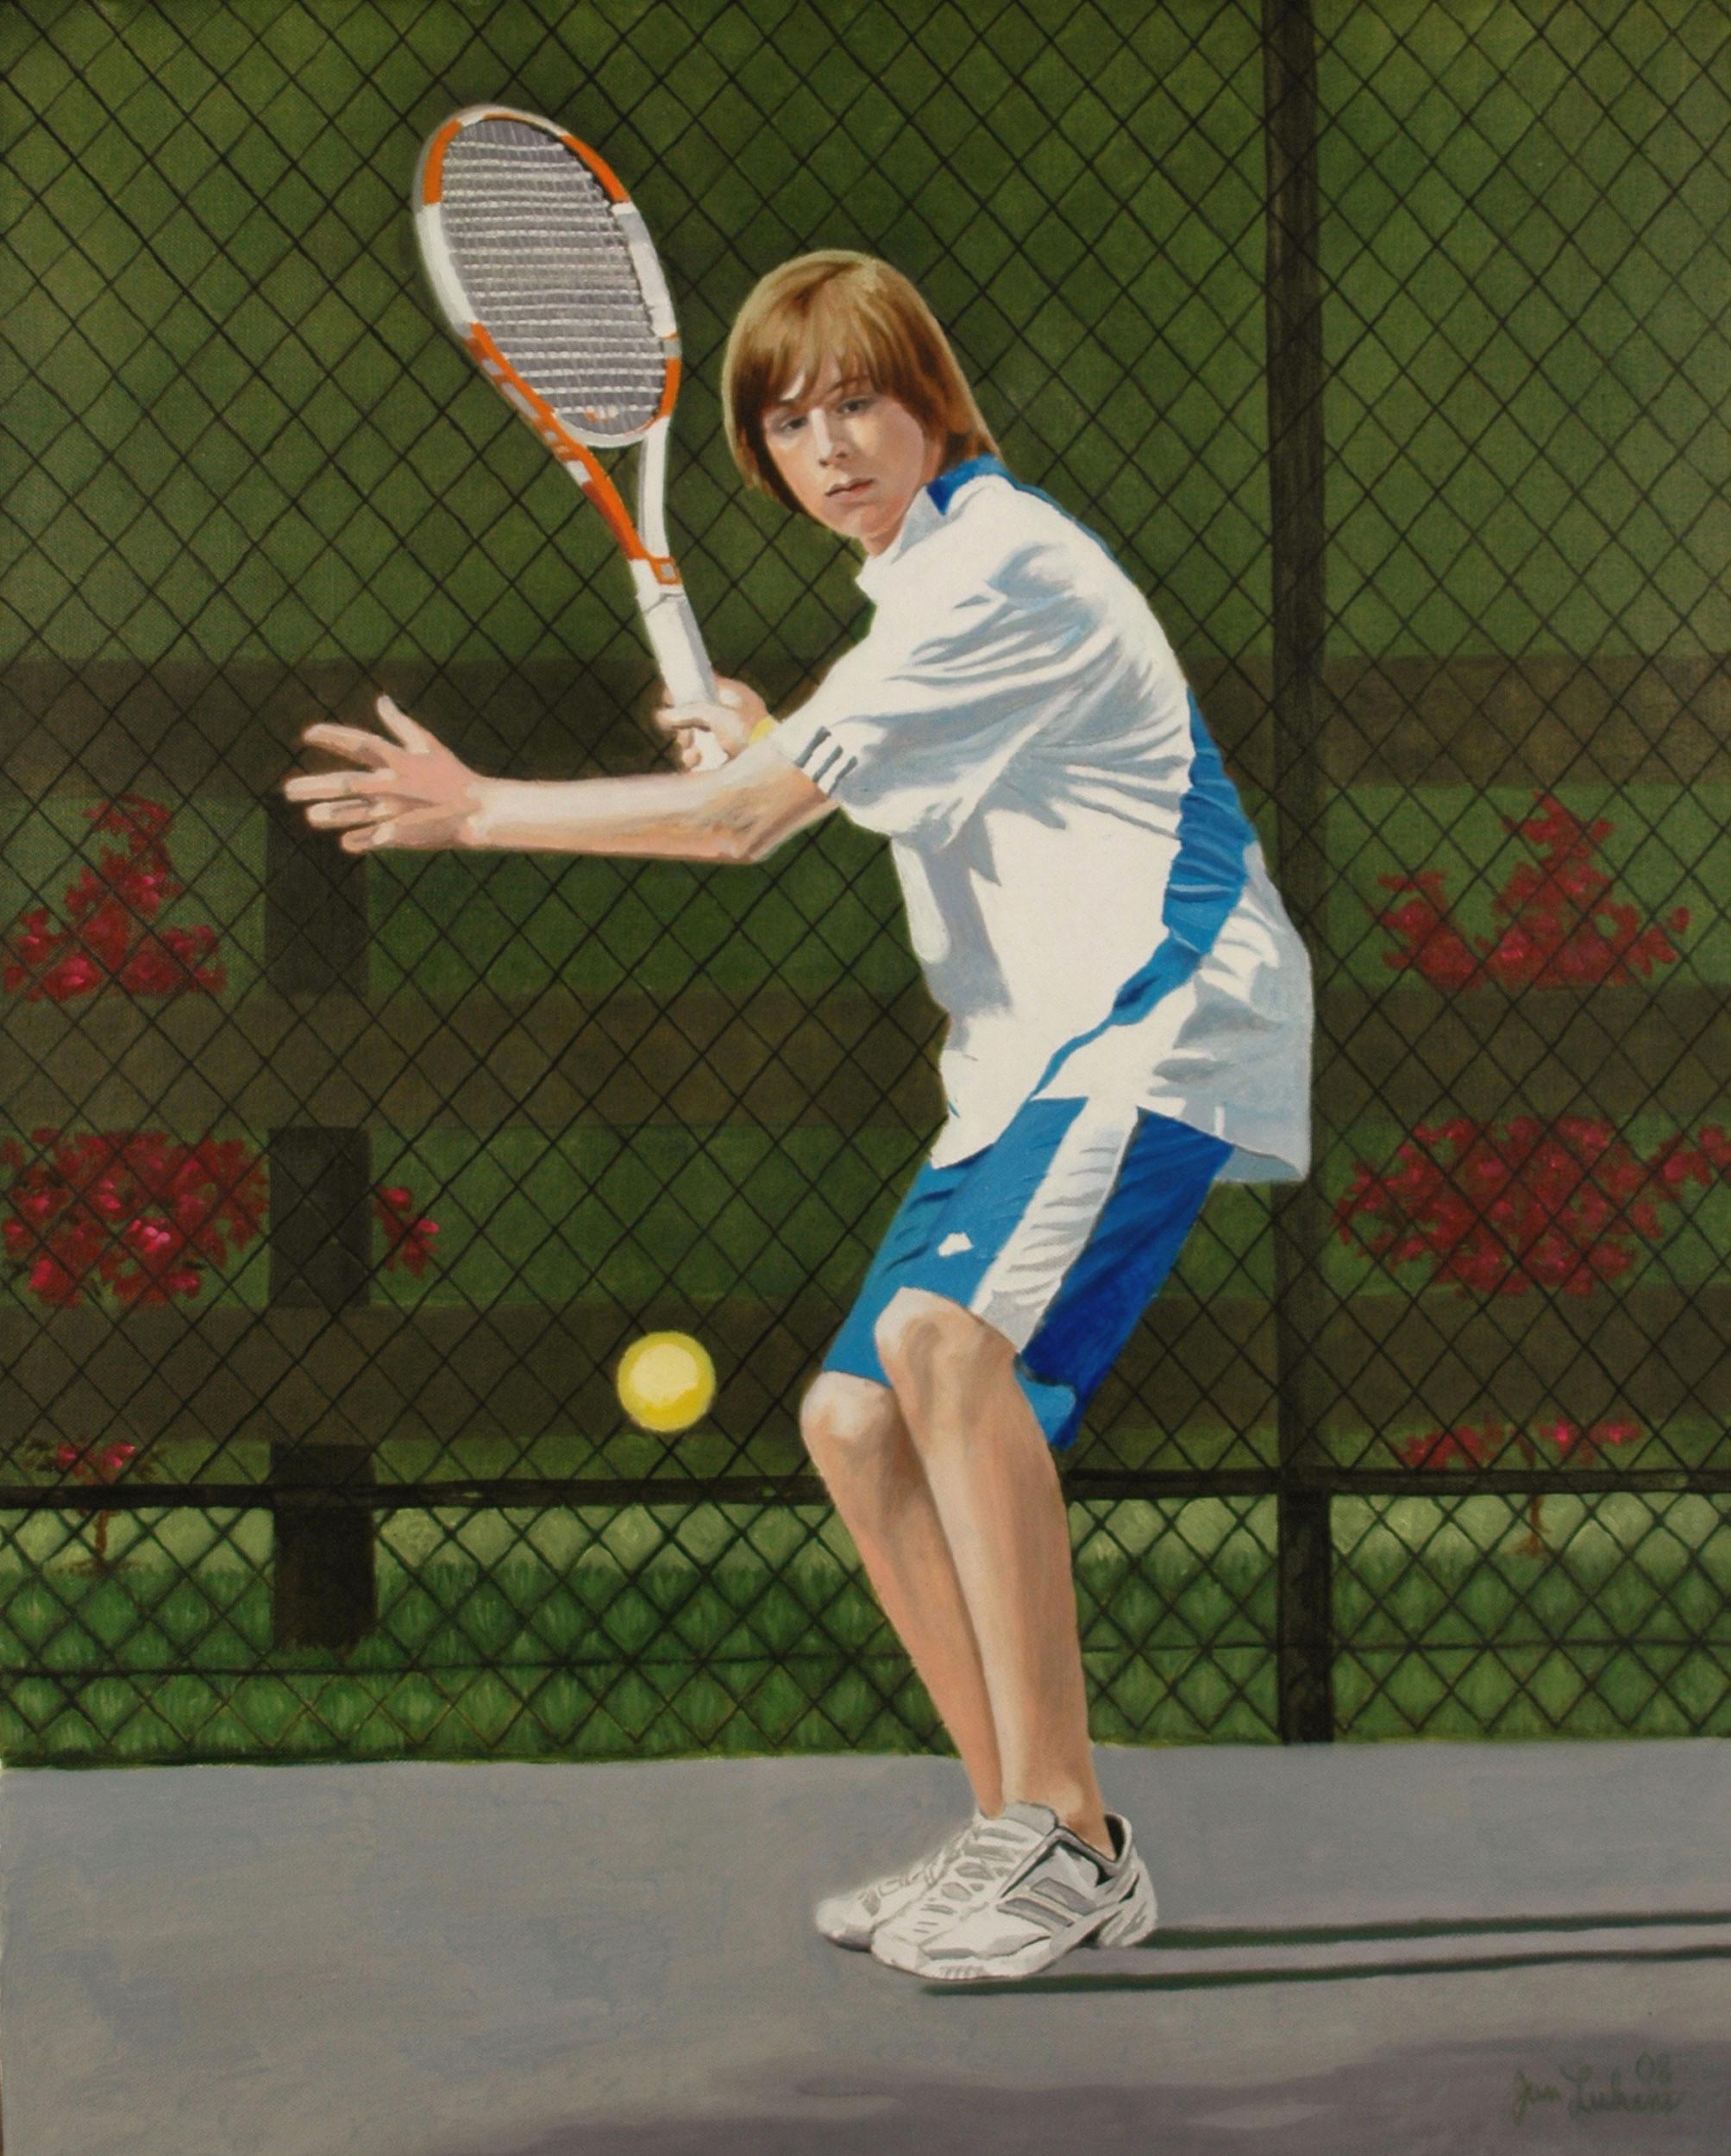 Liam Playing Tennis